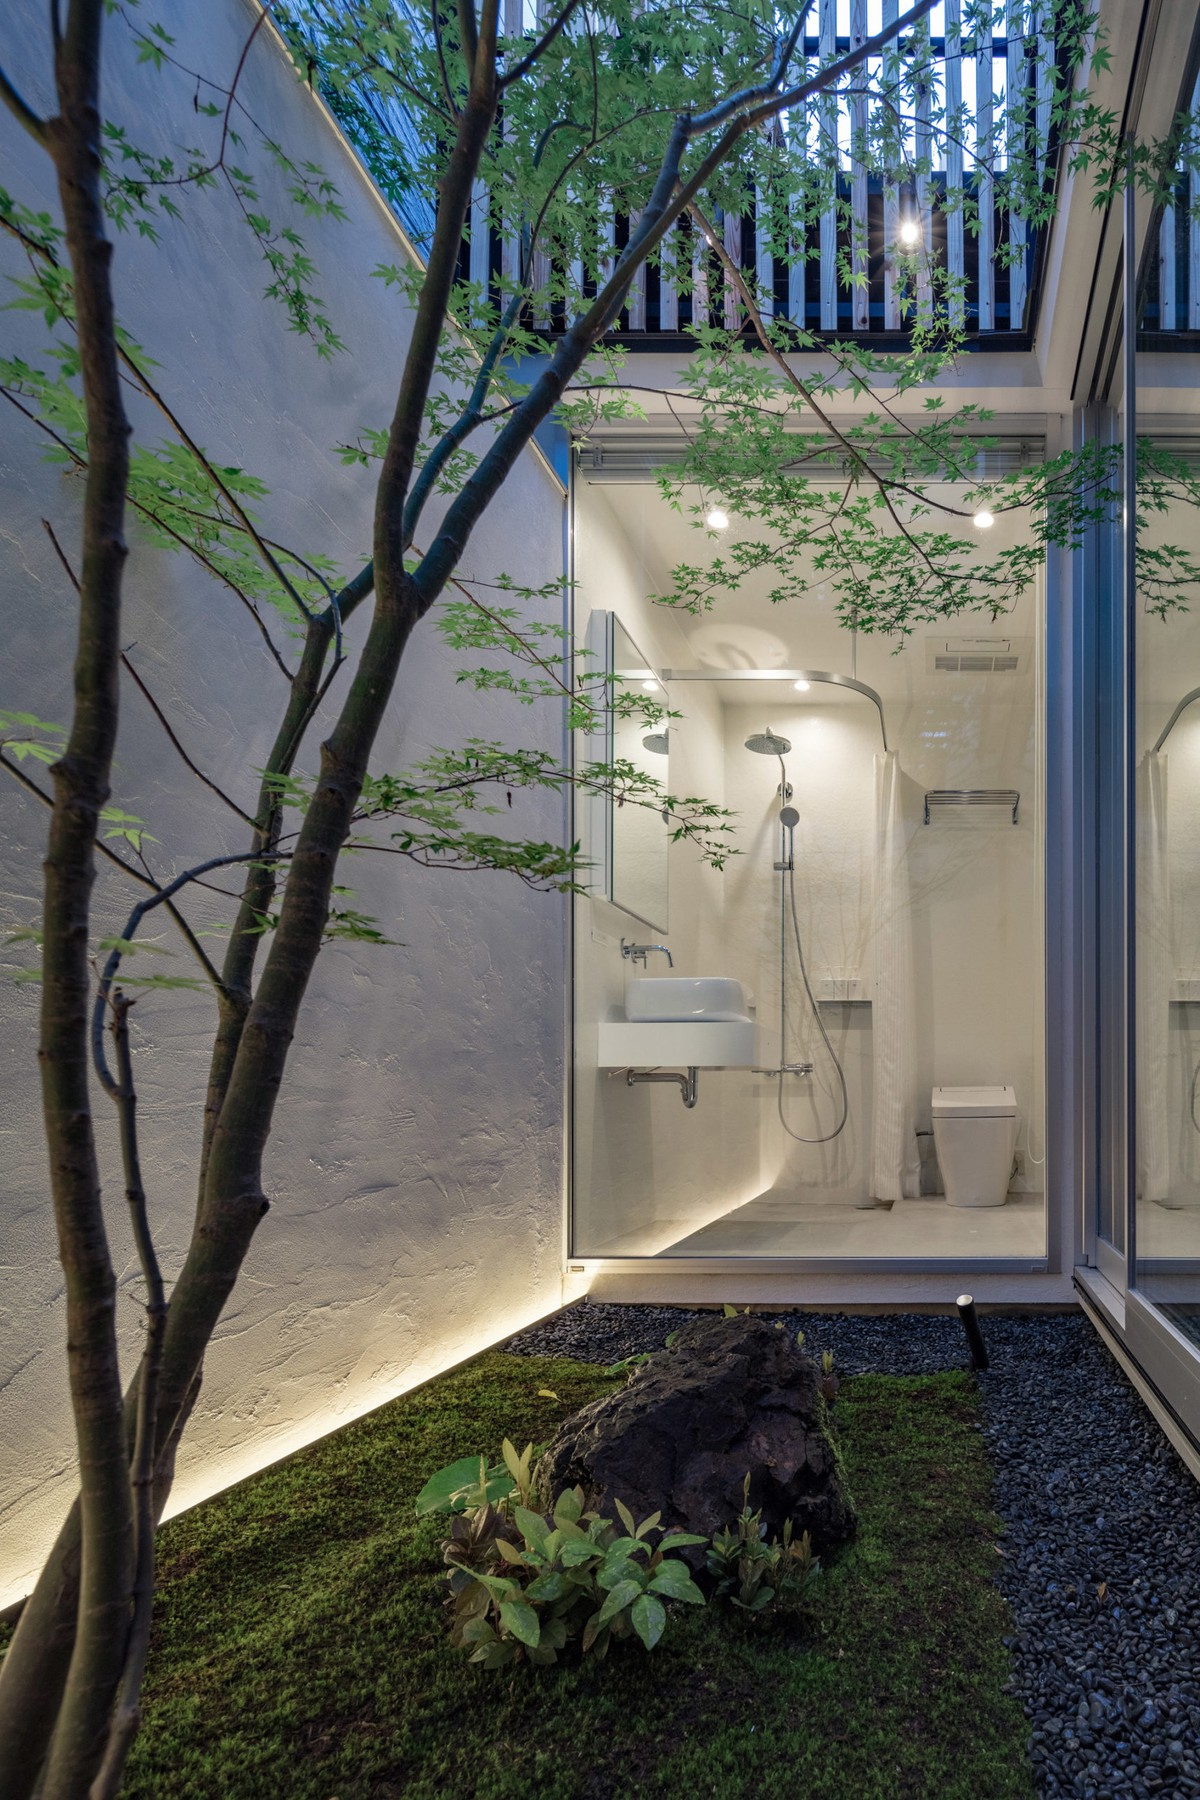 leibal_weekend-house-kyoto_kooo-architects_10-scaled.jpg